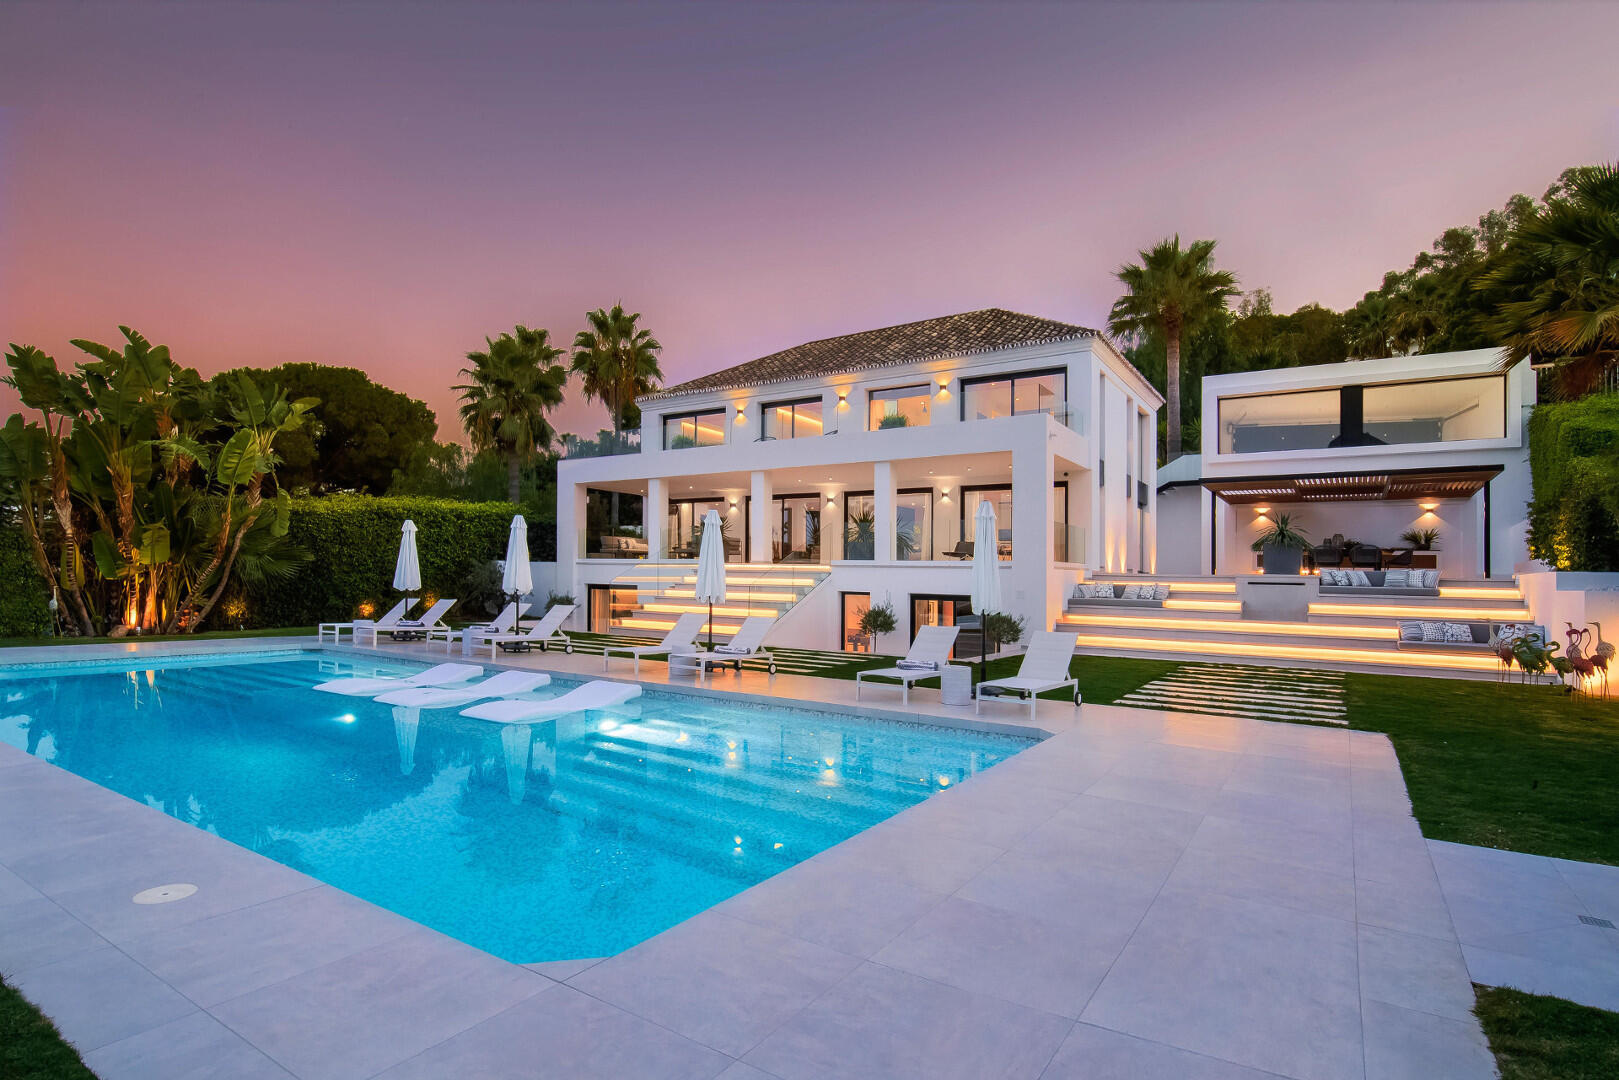 Scandinavian Design and Quality Villa with Stunning Views in Las Brisas Nueva Andalucia